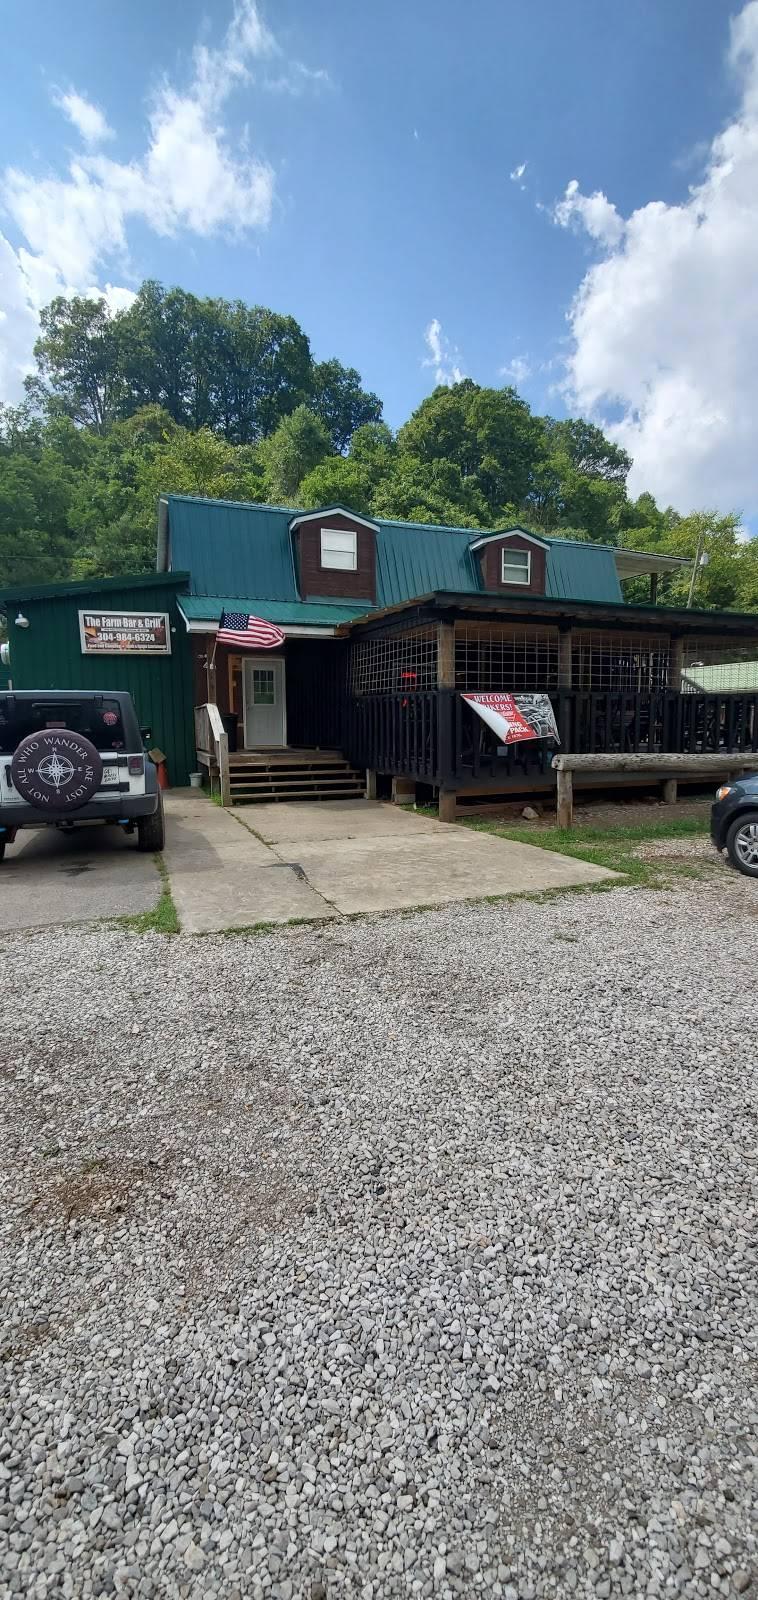 The Farm Bar & Grill   restaurant   5769 Kellys Creek Rd, Charleston, WV 25312, USA   3049846324 OR +1 304-984-6324